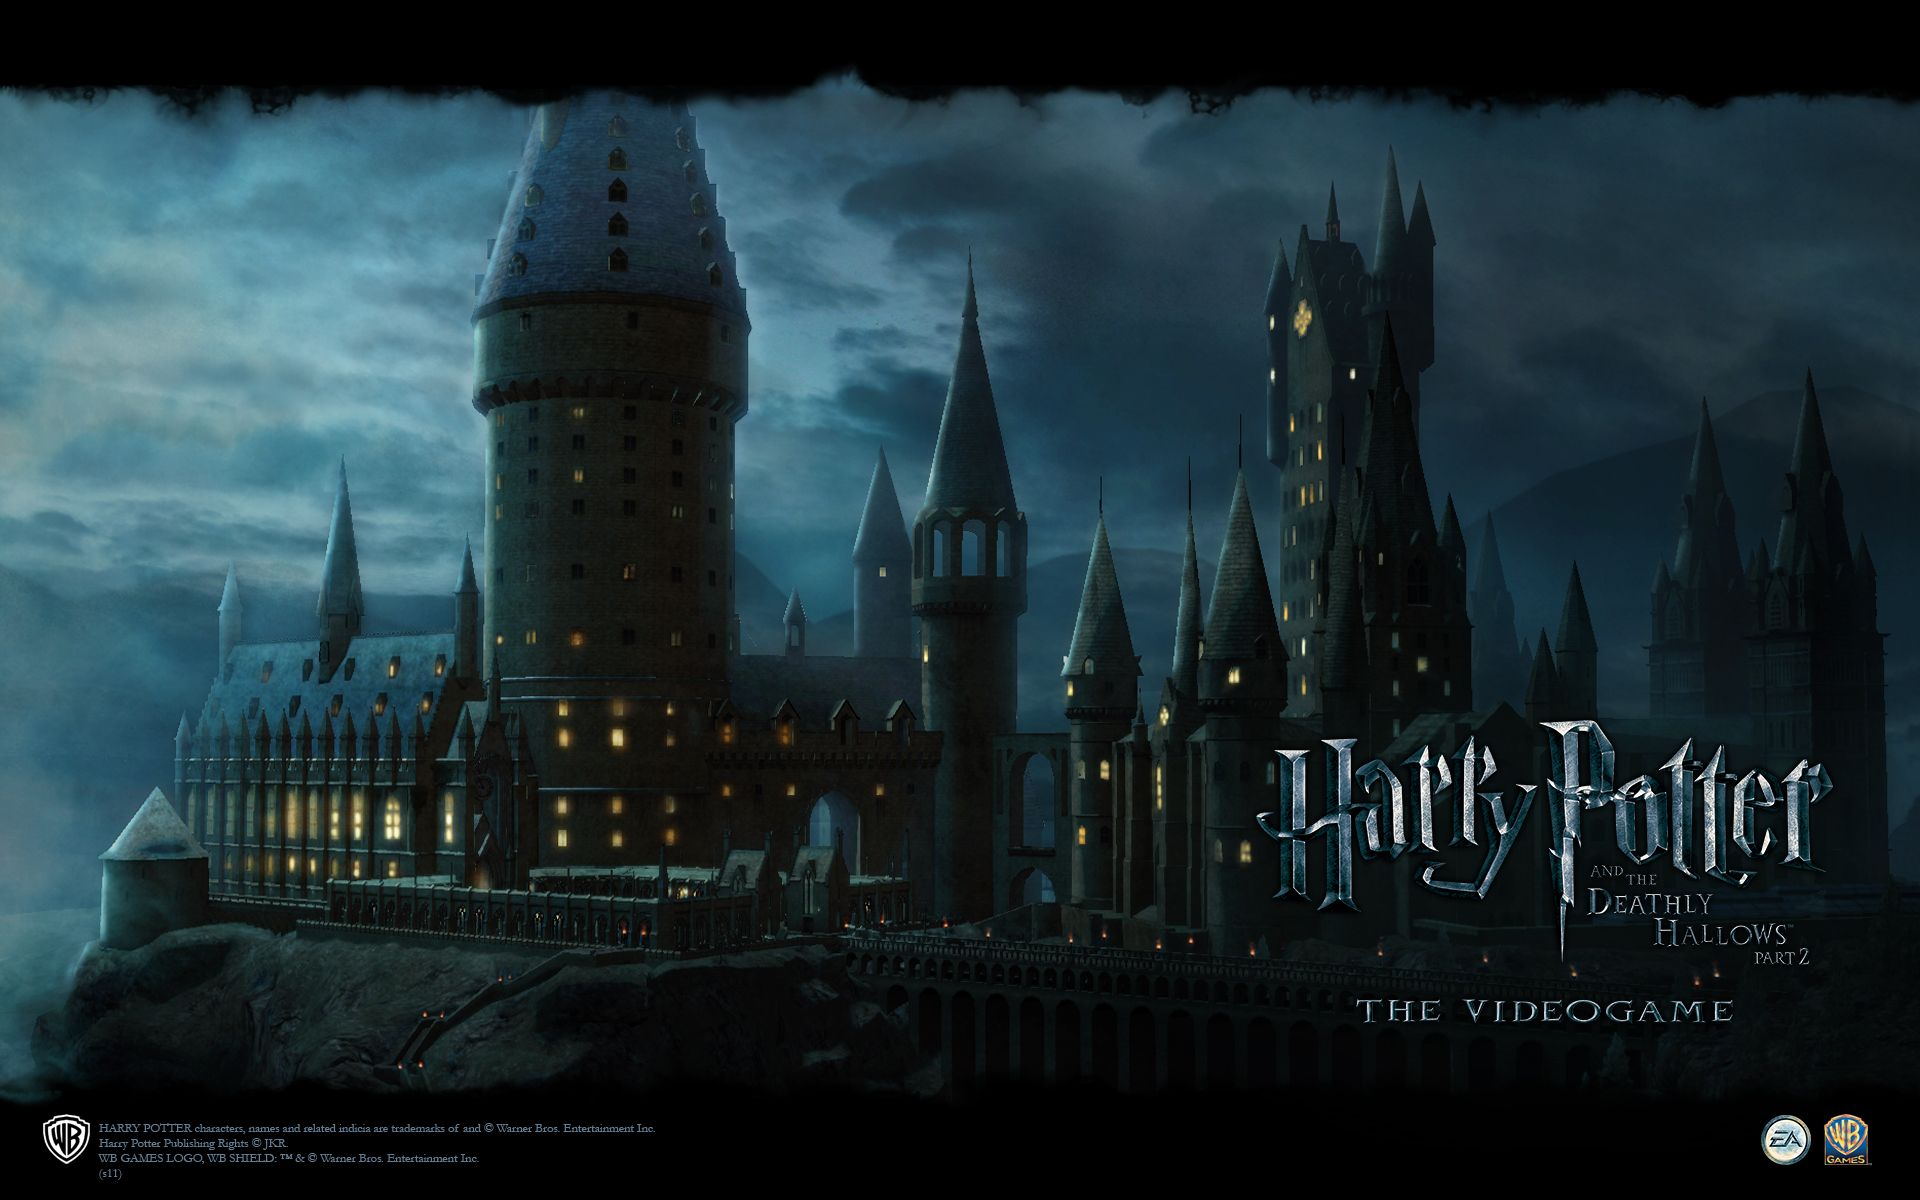 Pin By Marko Popovic On Wizarding World Harry Potter Wallpaper Slytherin Wallpaper Hogwarts Castle